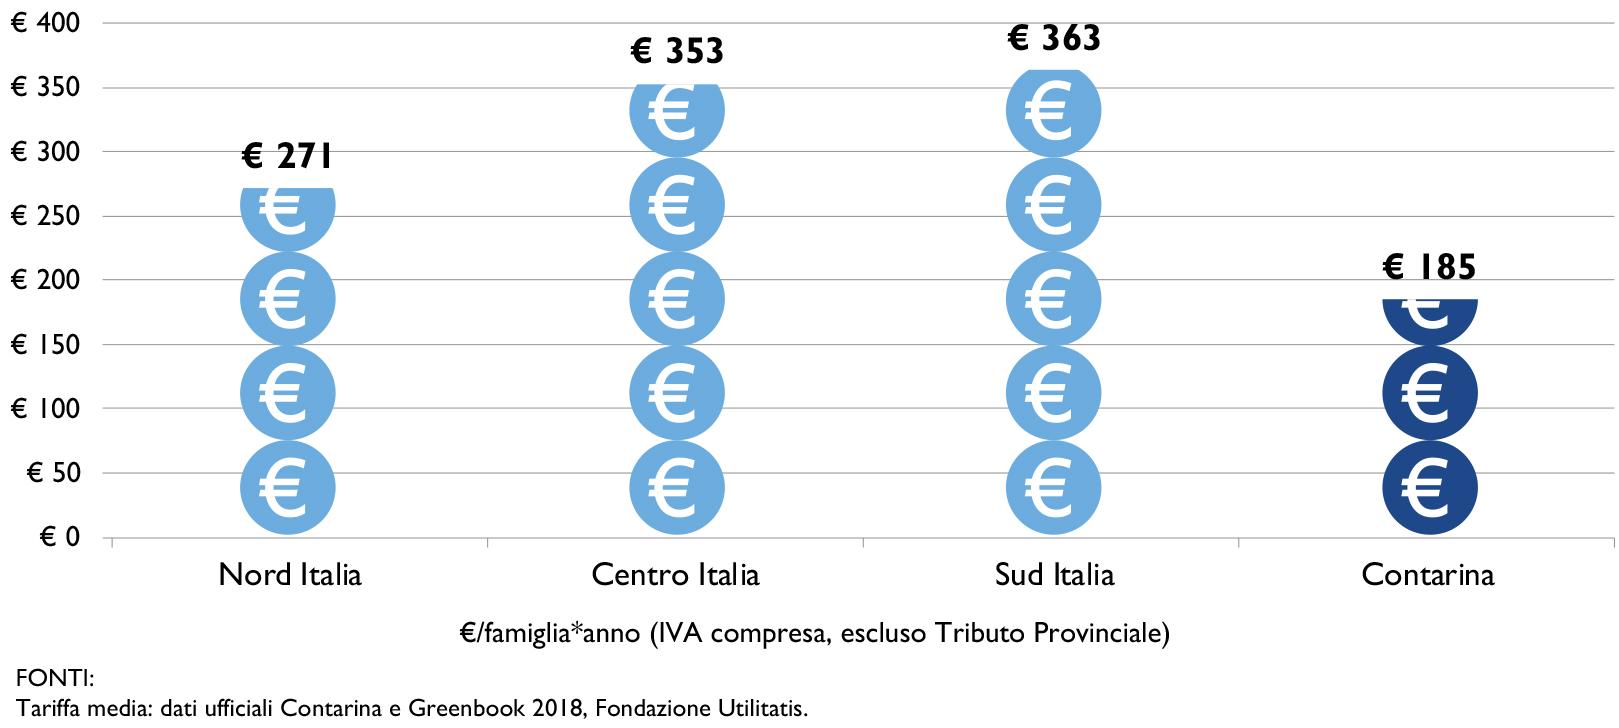 grafico-tariffa-contarina_web